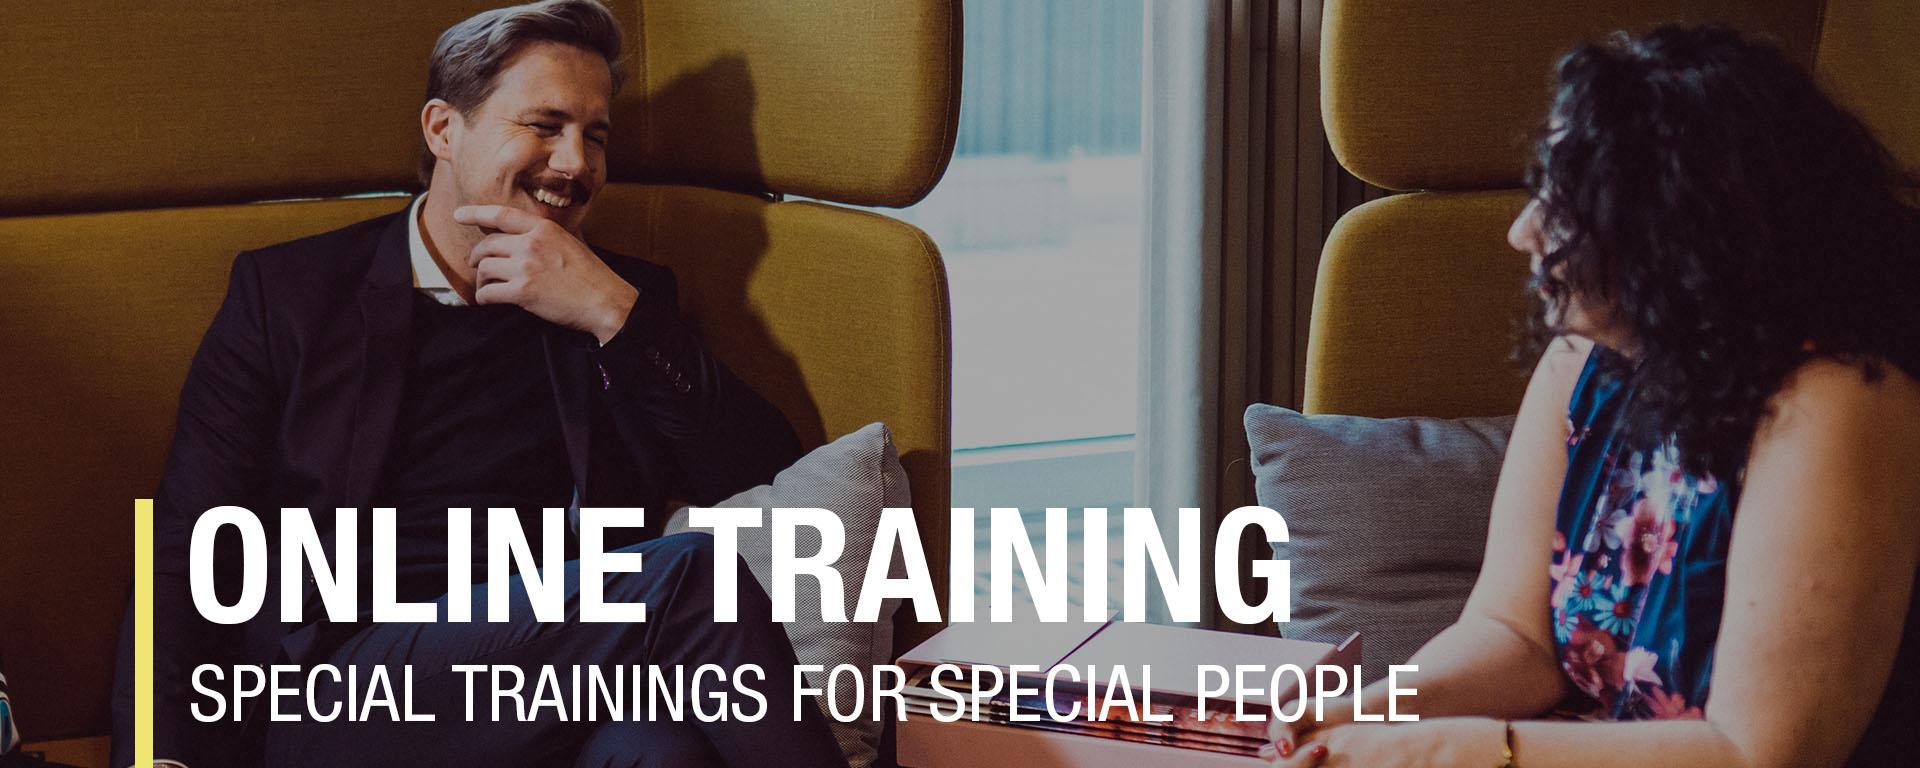 Communication training, presentation training, online presenting, online meetings, digital leadership